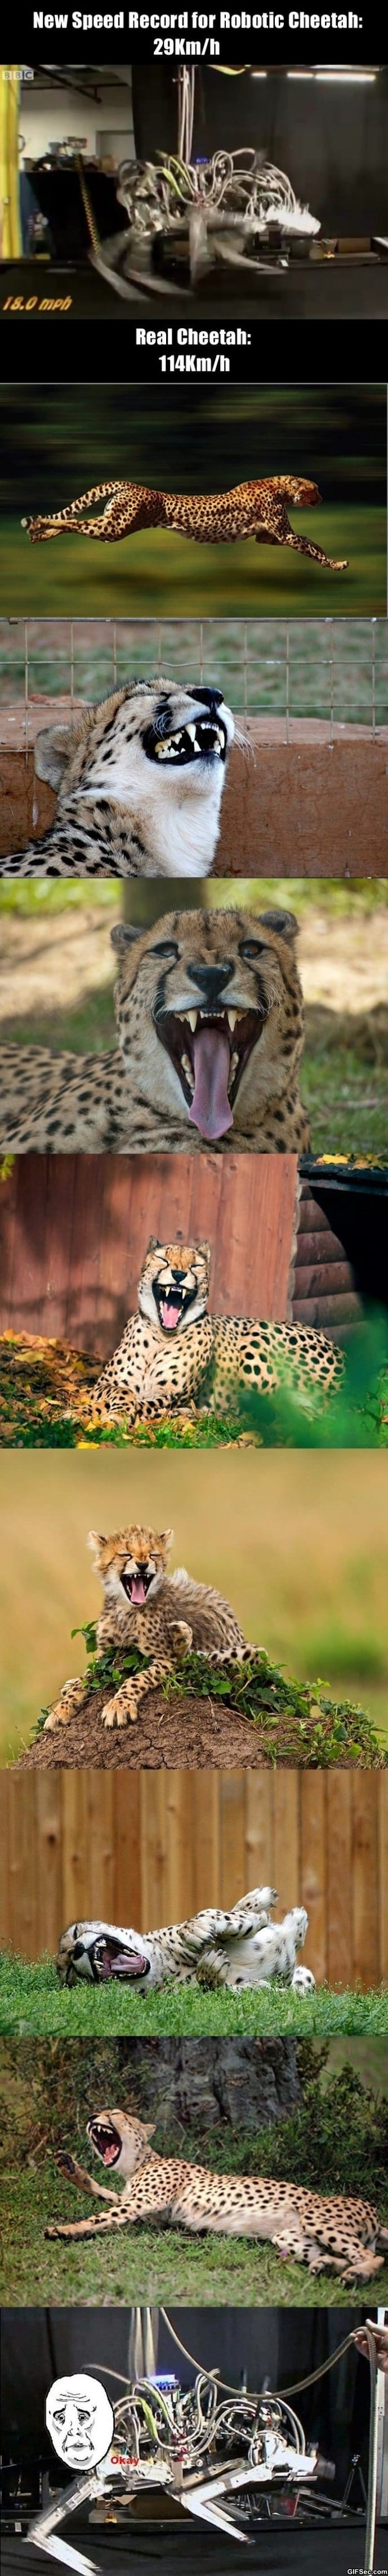 robotic-cheetah